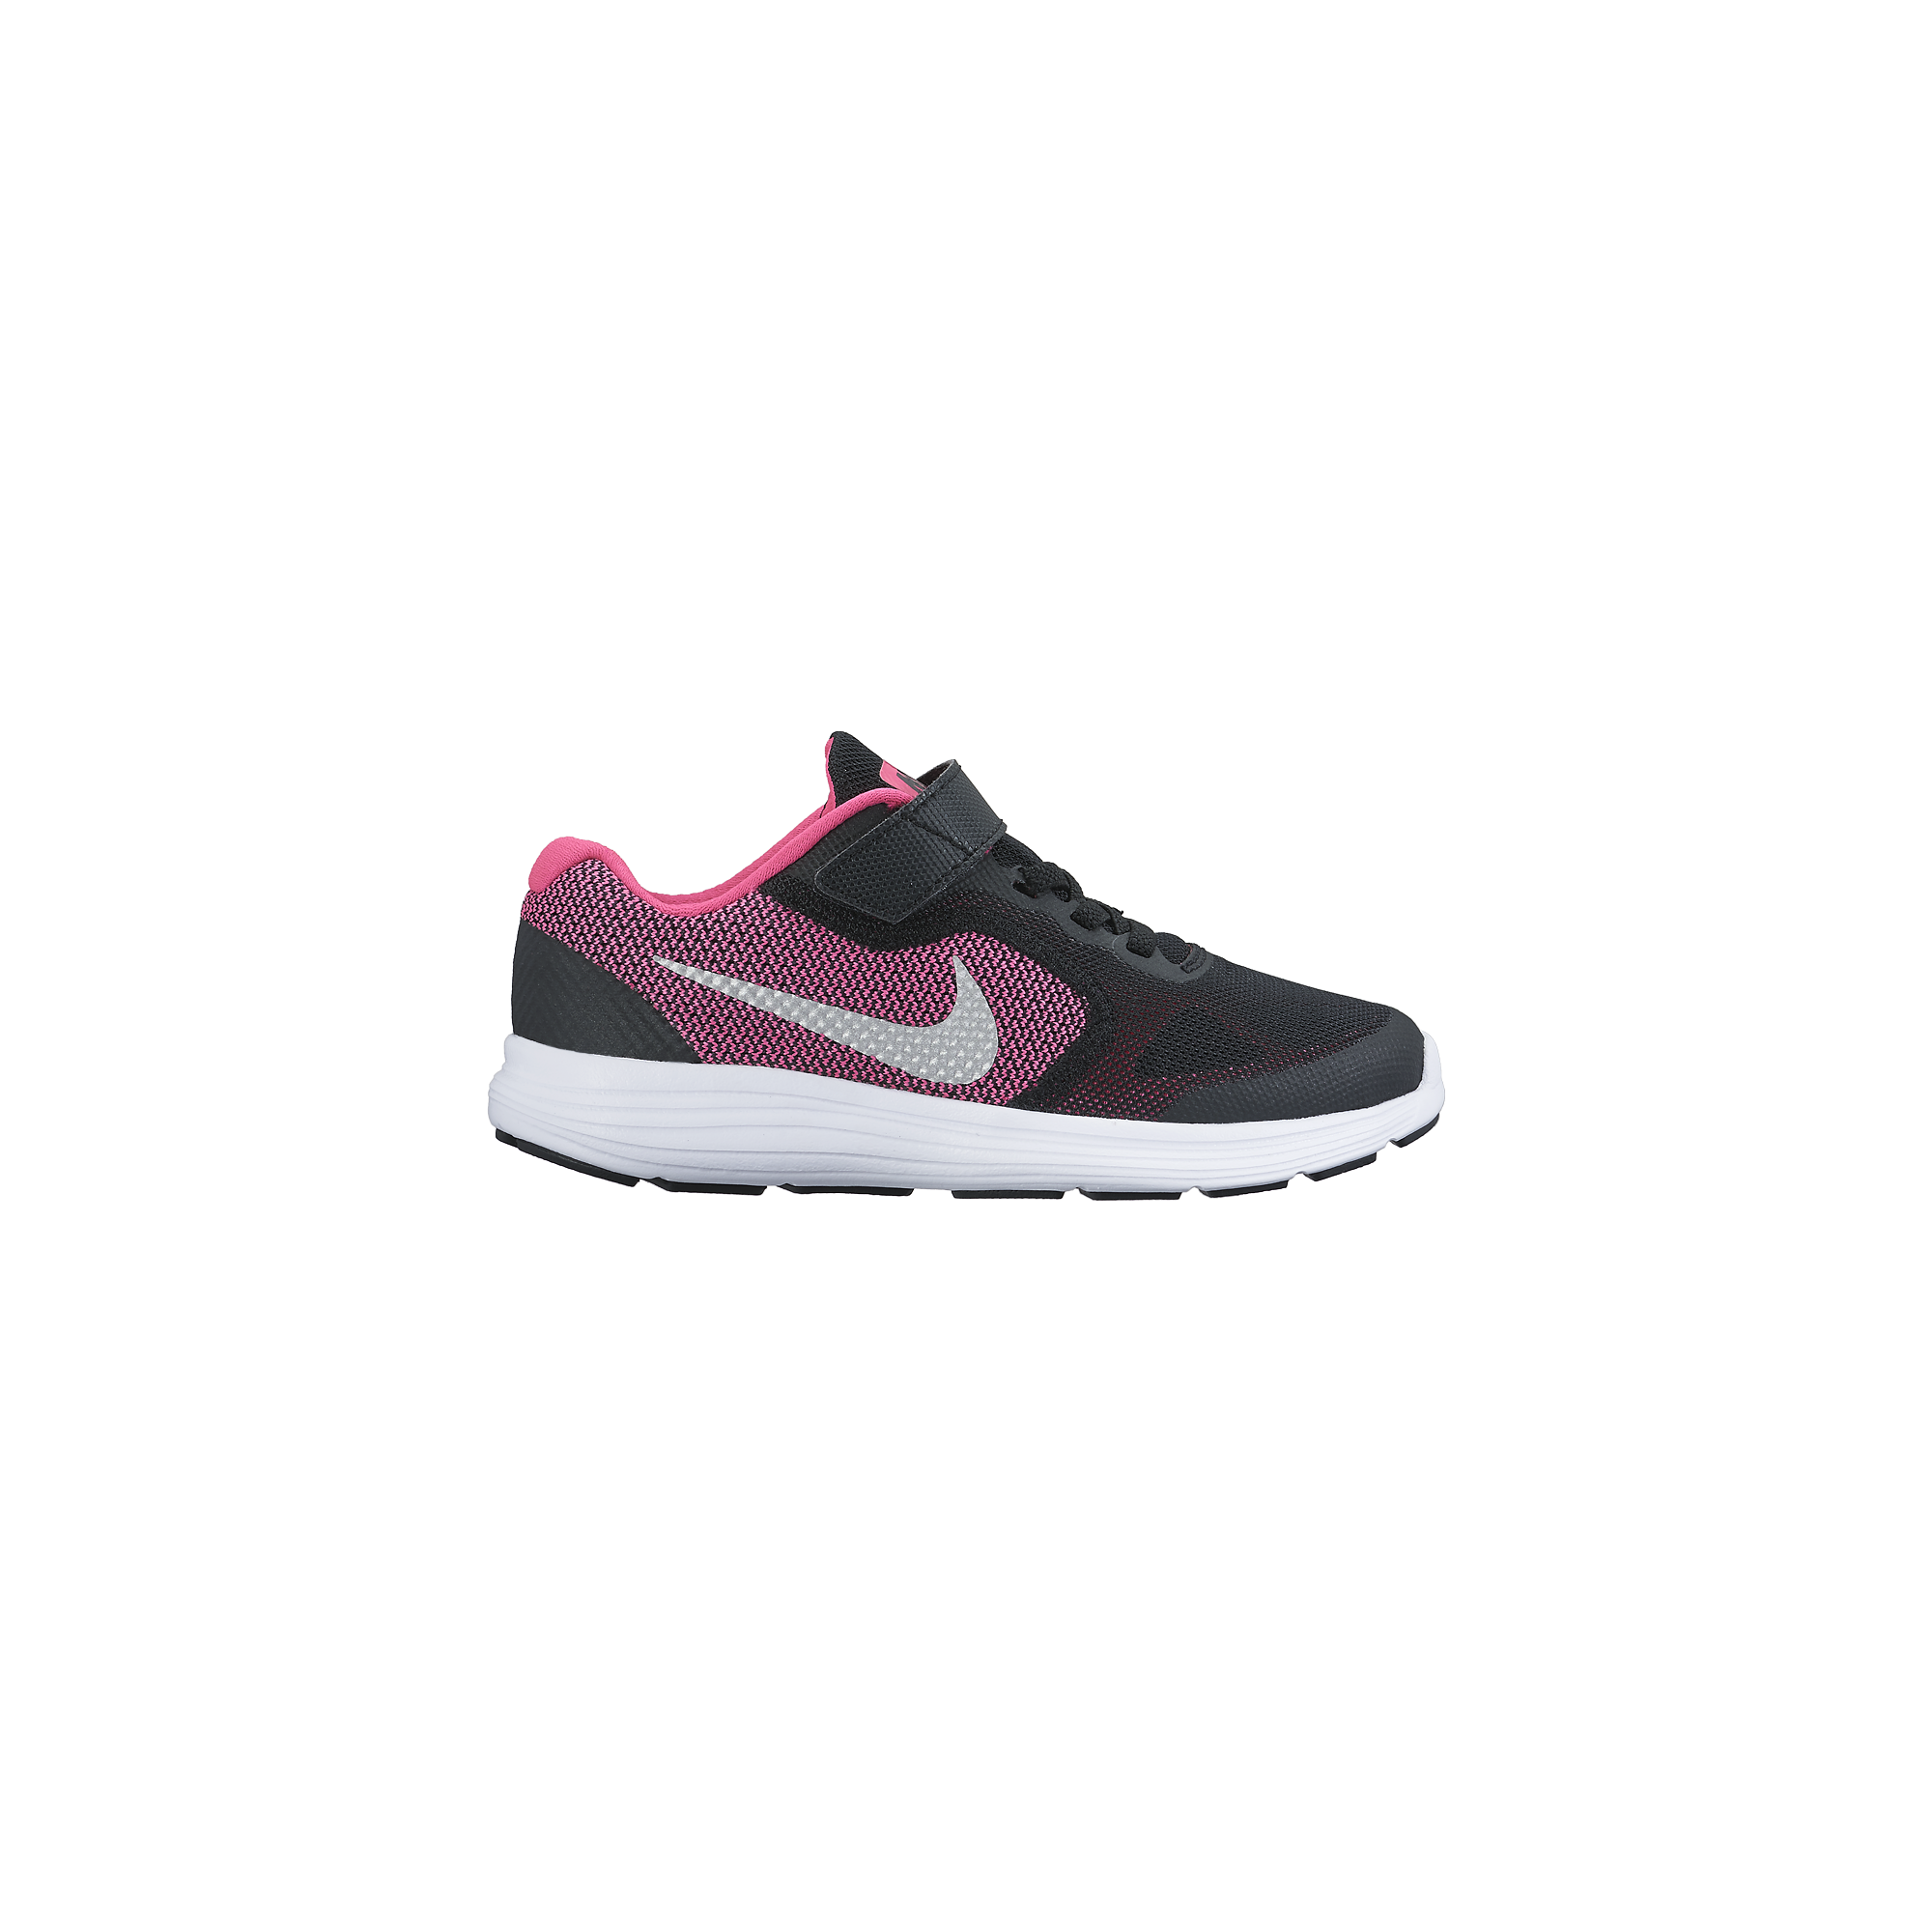 Revolution 001 819417 Gyerek Utcai Nike Cipő 3 Girls kwP08On